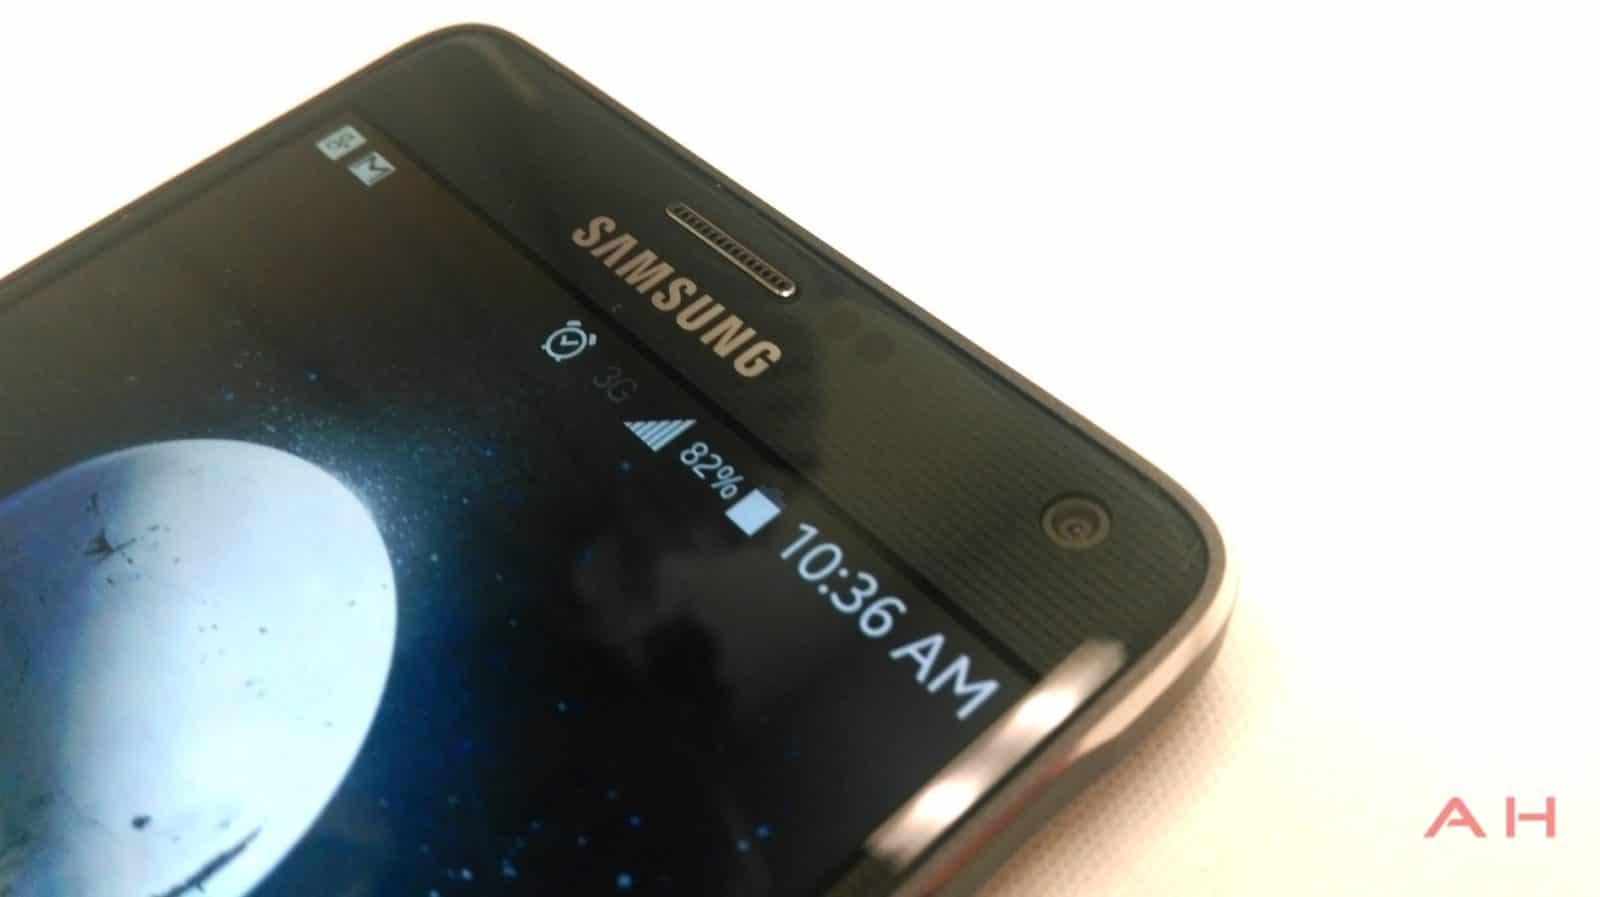 AH Galaxy Note 4-15